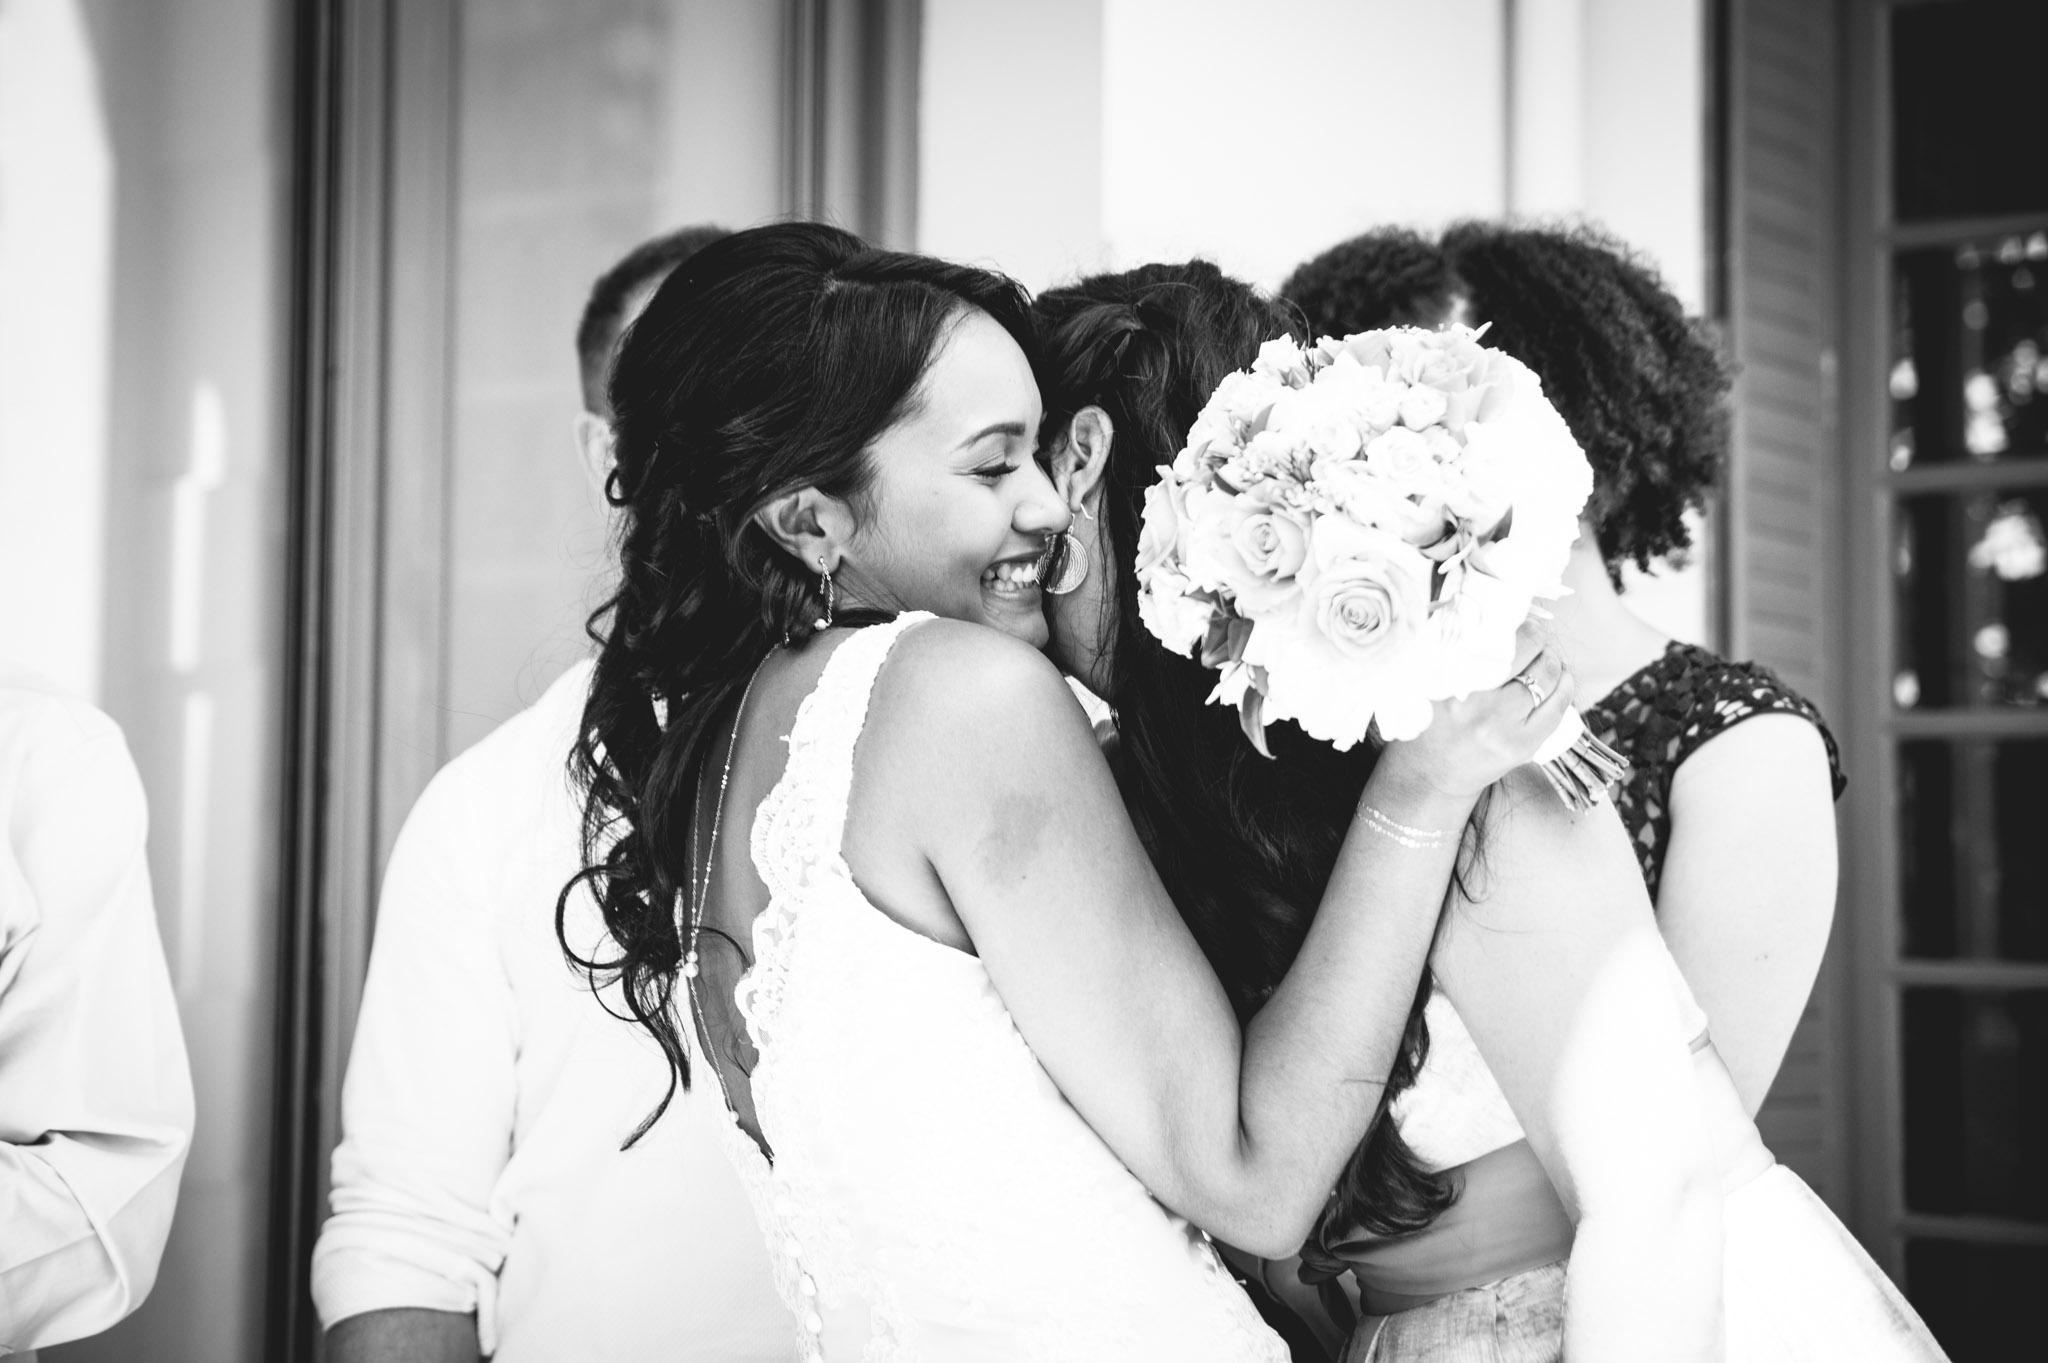 2017-07-15 - DSC_7664 - photographe - mariage - www.lauriediazwedding.com.jpg